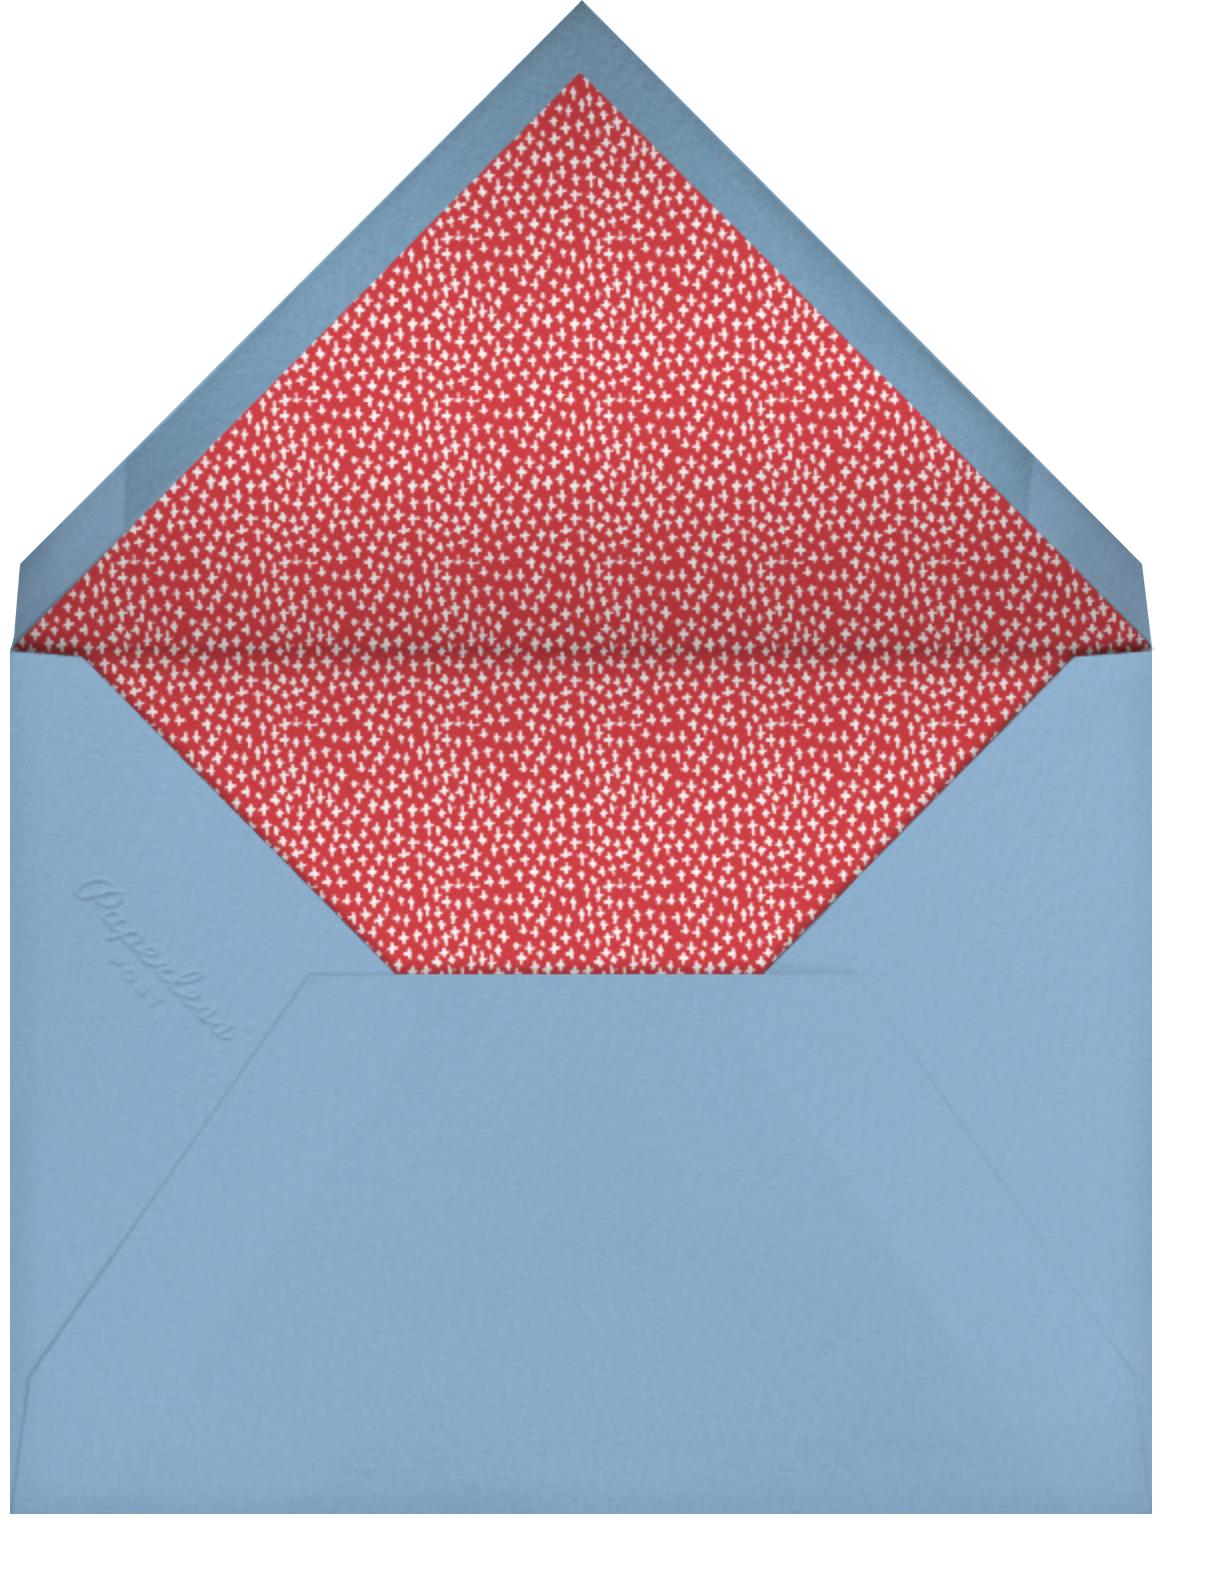 Let's Bounce - Mr. Boddington's Studio - Kids' birthday - envelope back